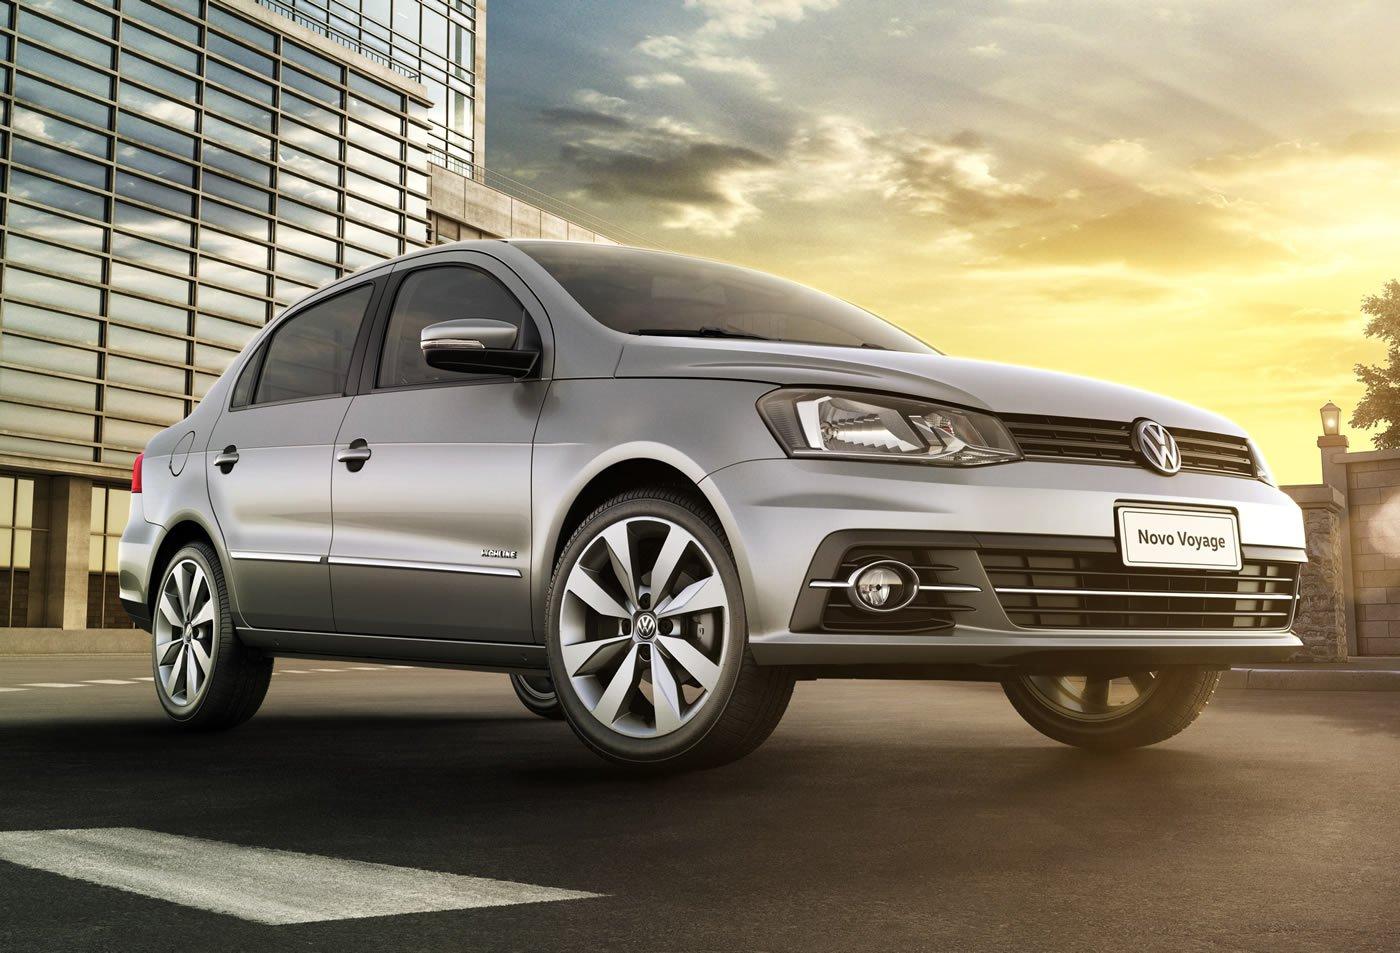 ... cara (quase) nova e multimídia: Volkswagen lança Gol e Voyage 2017